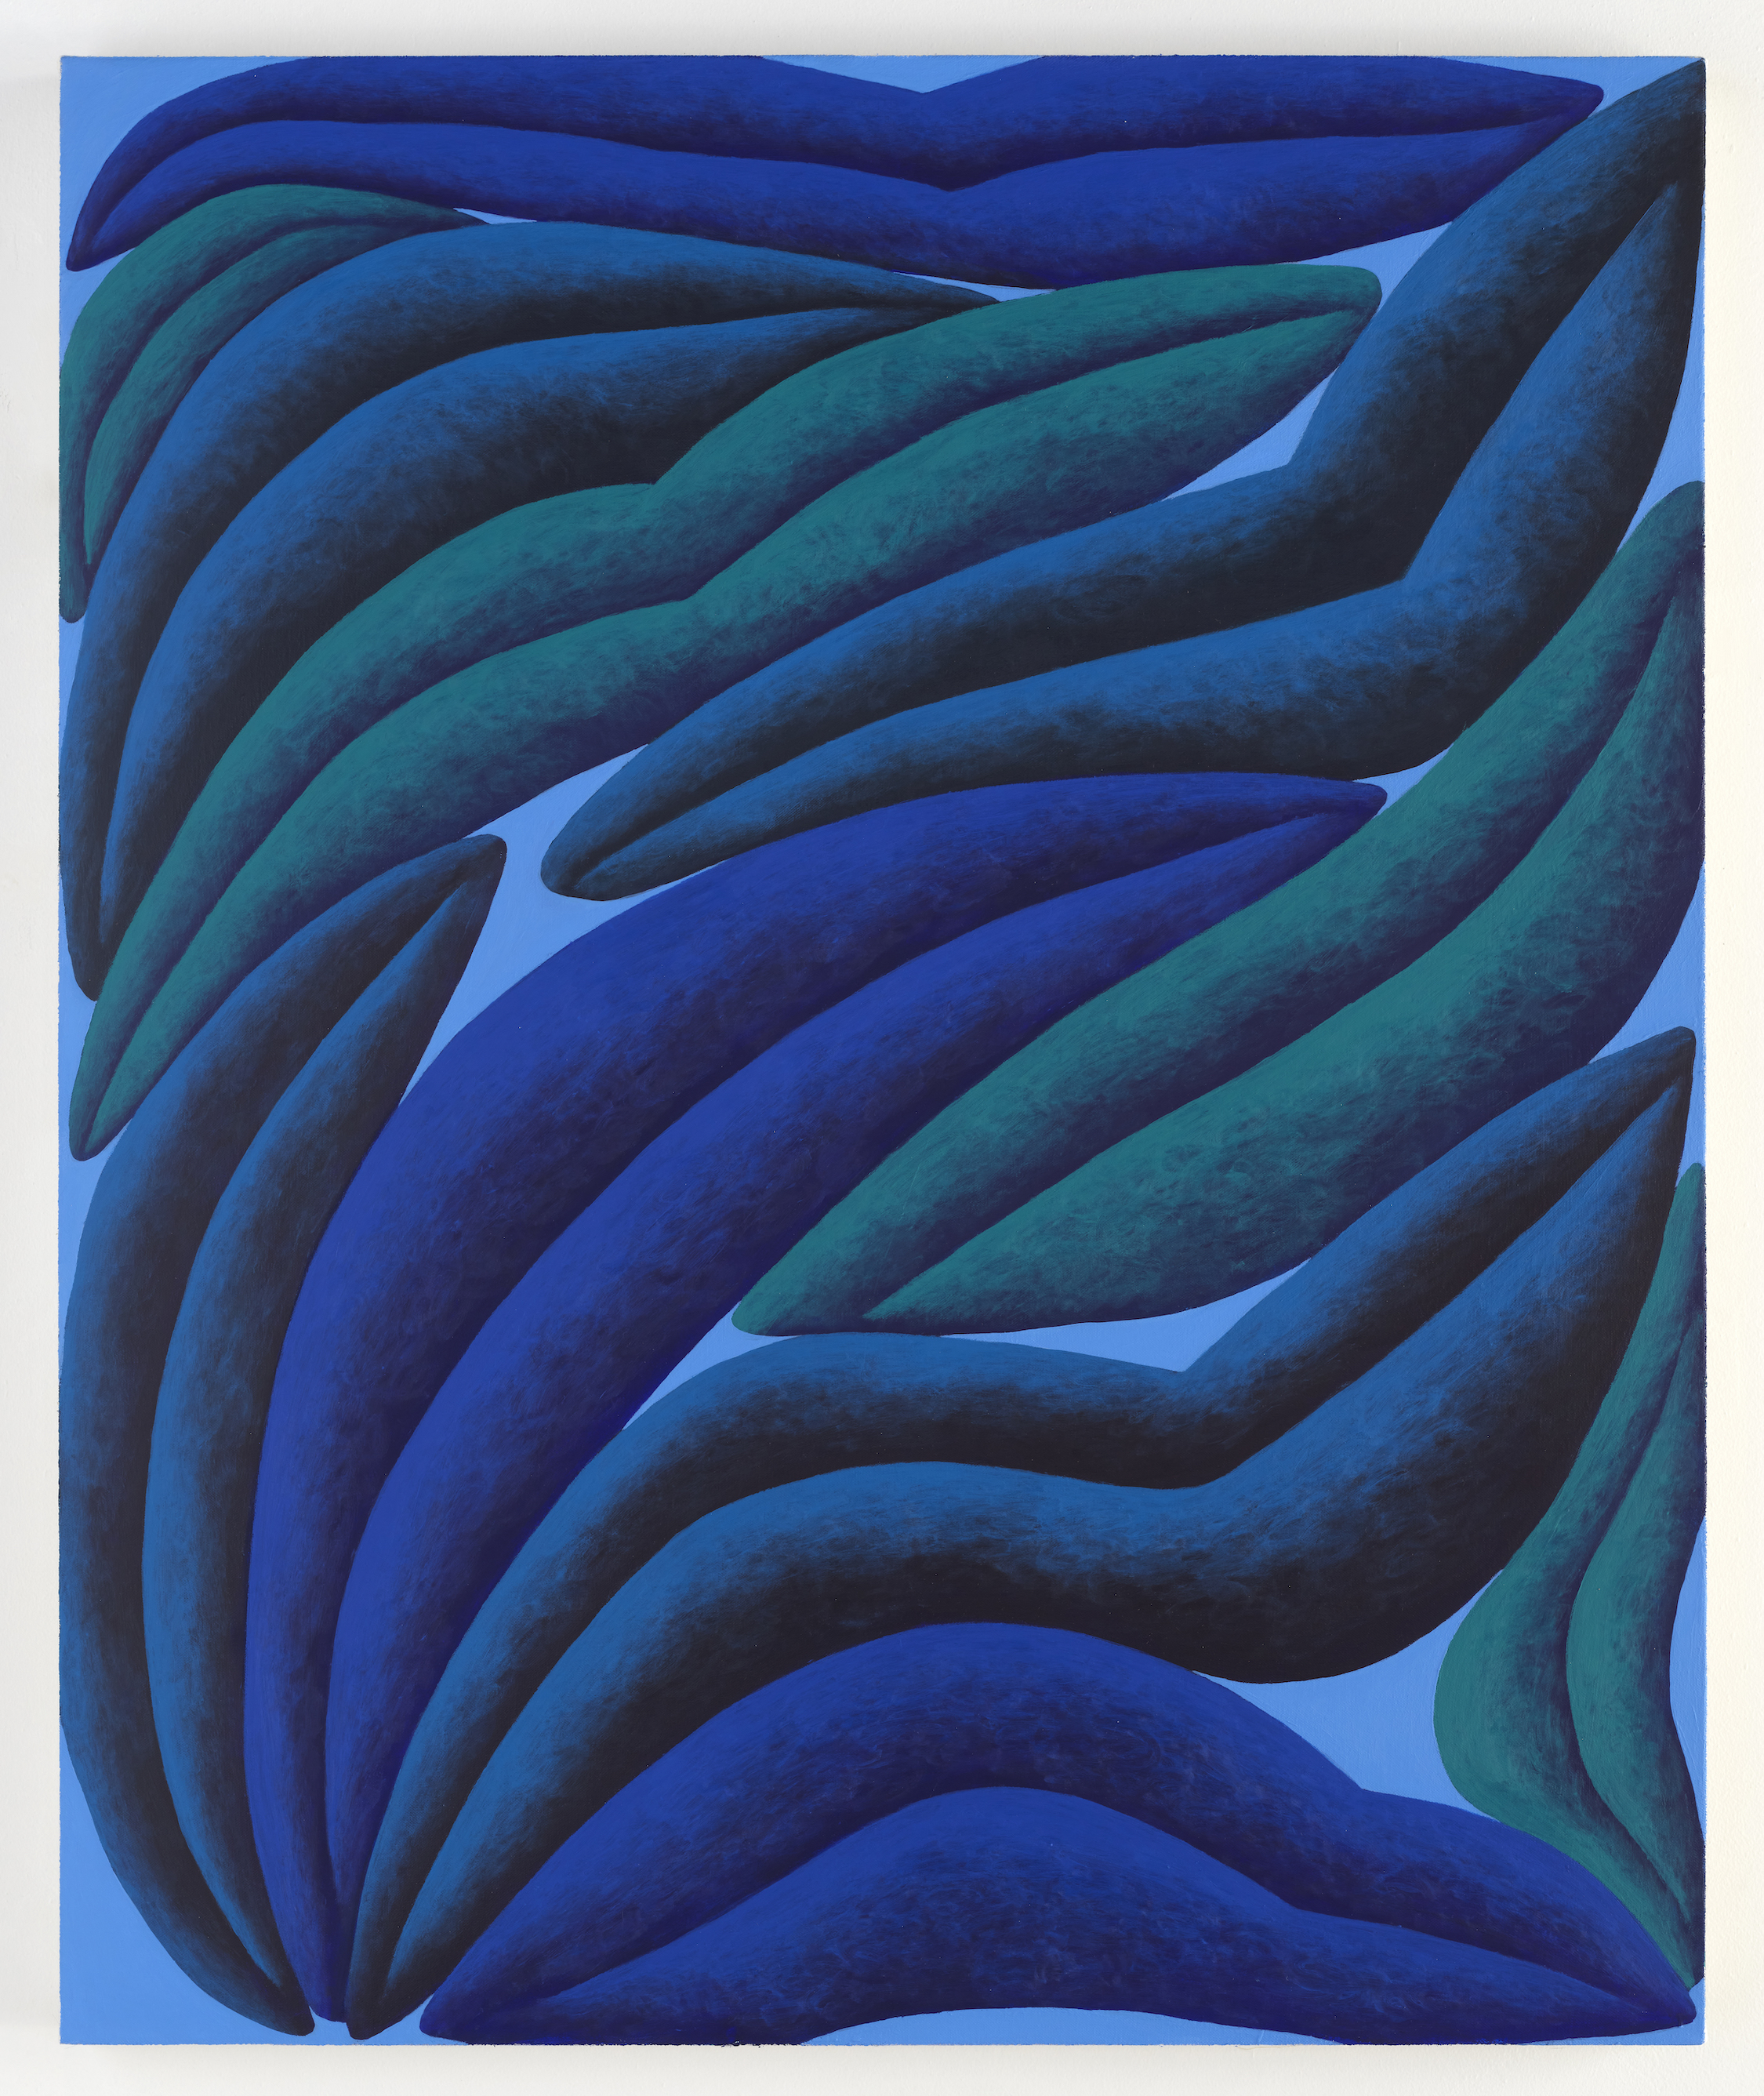 Corydon Cowansage, Blues, 2020, acrylic on canvas, 37 × 31 inches